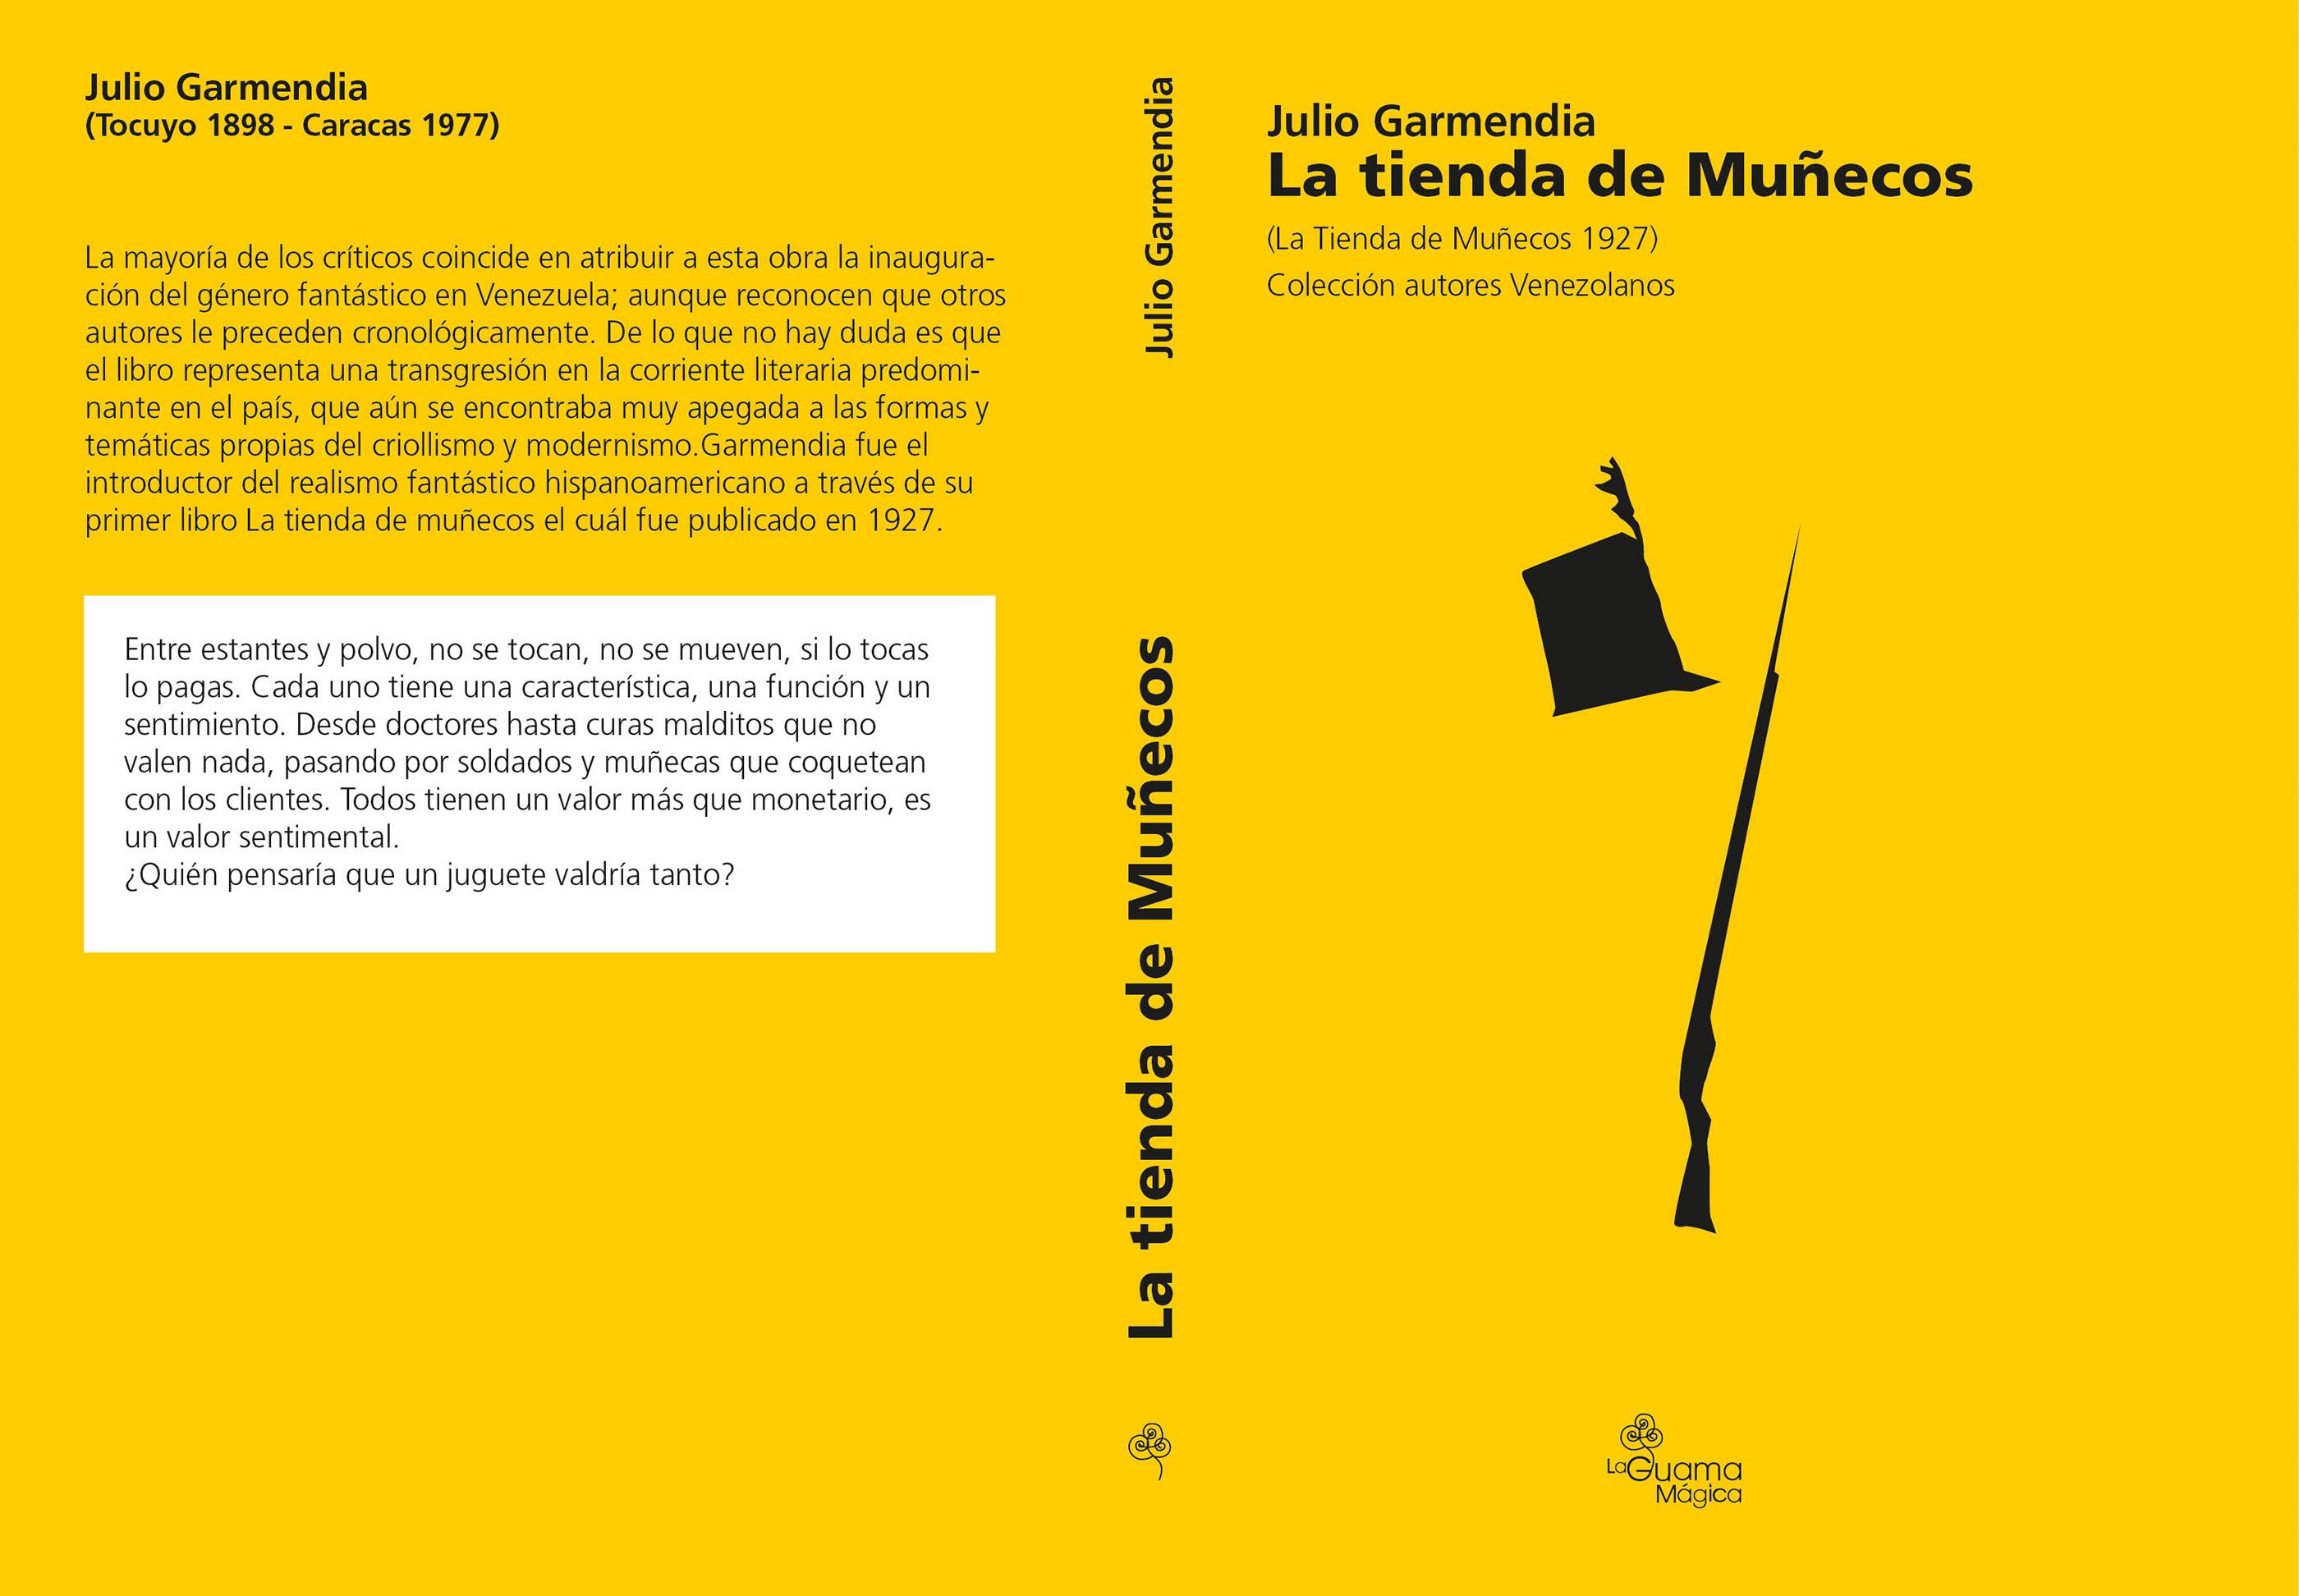 DesignBook On Cover Behance Cover DesignBook Behance Editorial DesignBook Editorial On Editorial odBWCxre